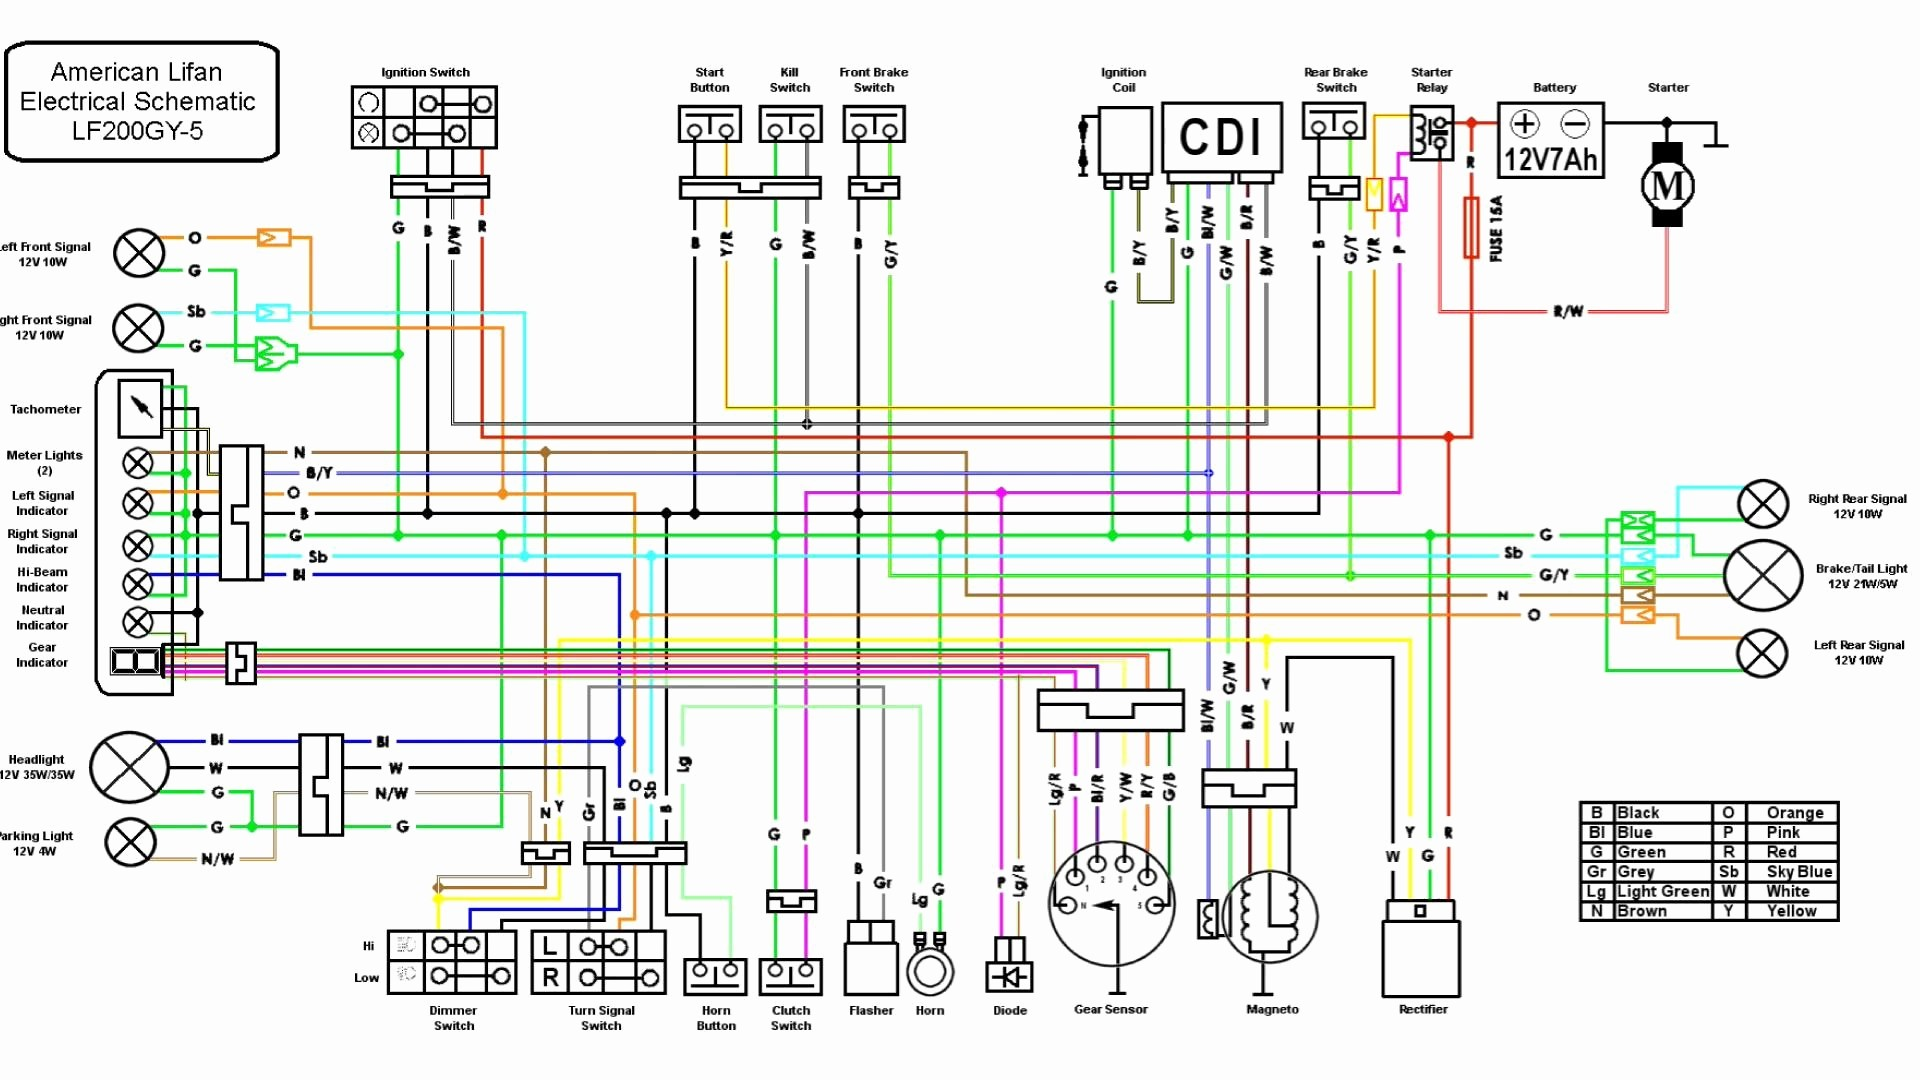 Bike Wiring Diagram Wiring Diagram Motorcycle Wiring Diagram Beautiful Wds Bmw Wiring Of Bike Wiring Diagram